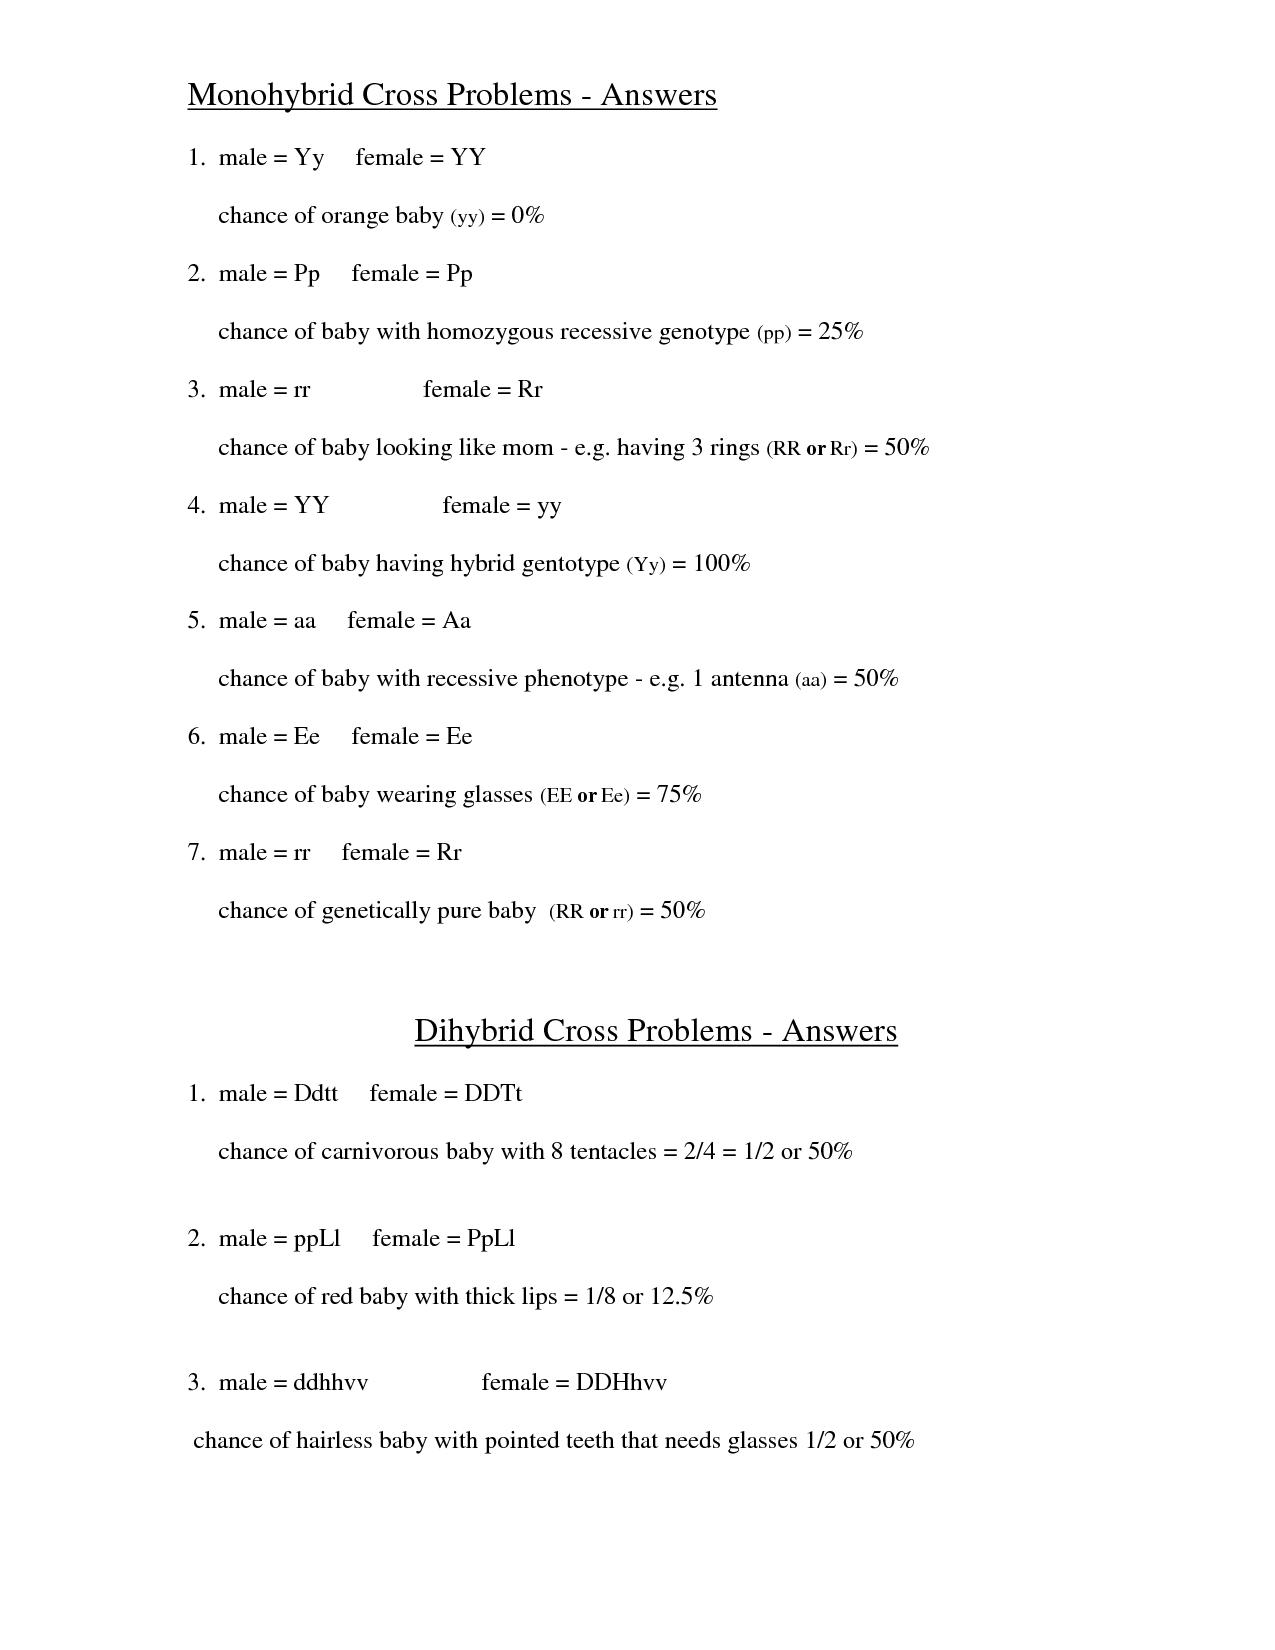 Genetics Monohybrid Cross Worksheet Answers